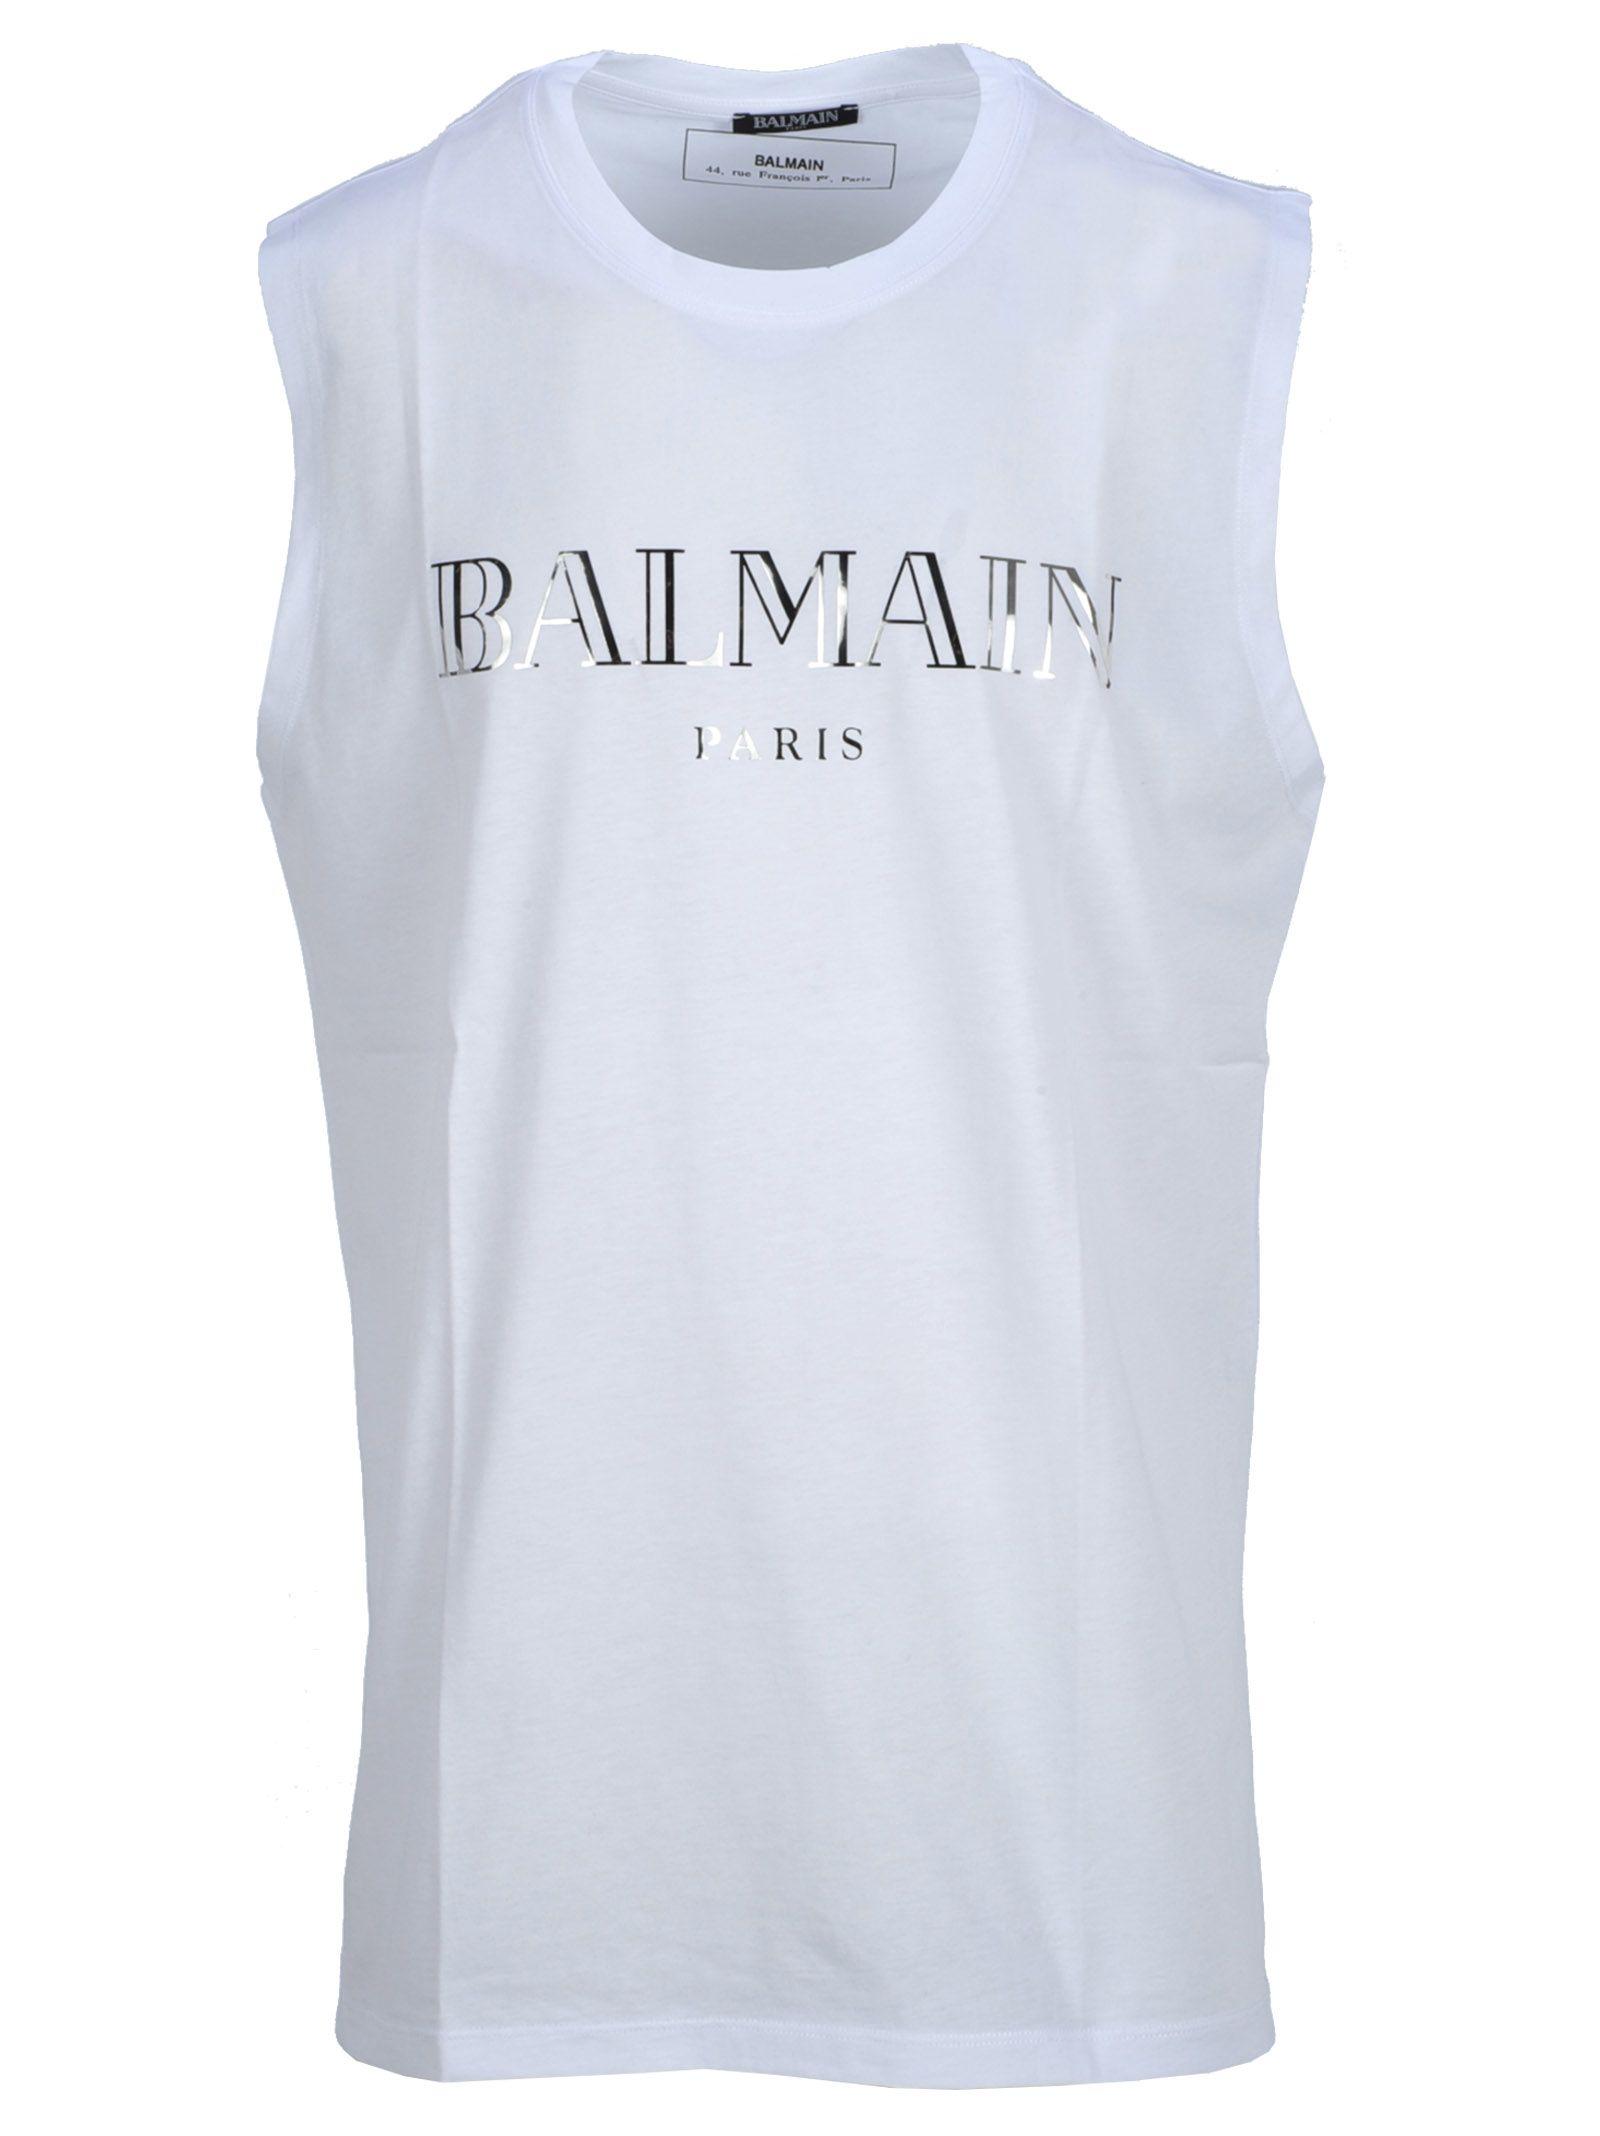 69447cc6ac66e0 Balmain Balmain Balmain Logo Print T-shirt - WHITE + SILVER ...